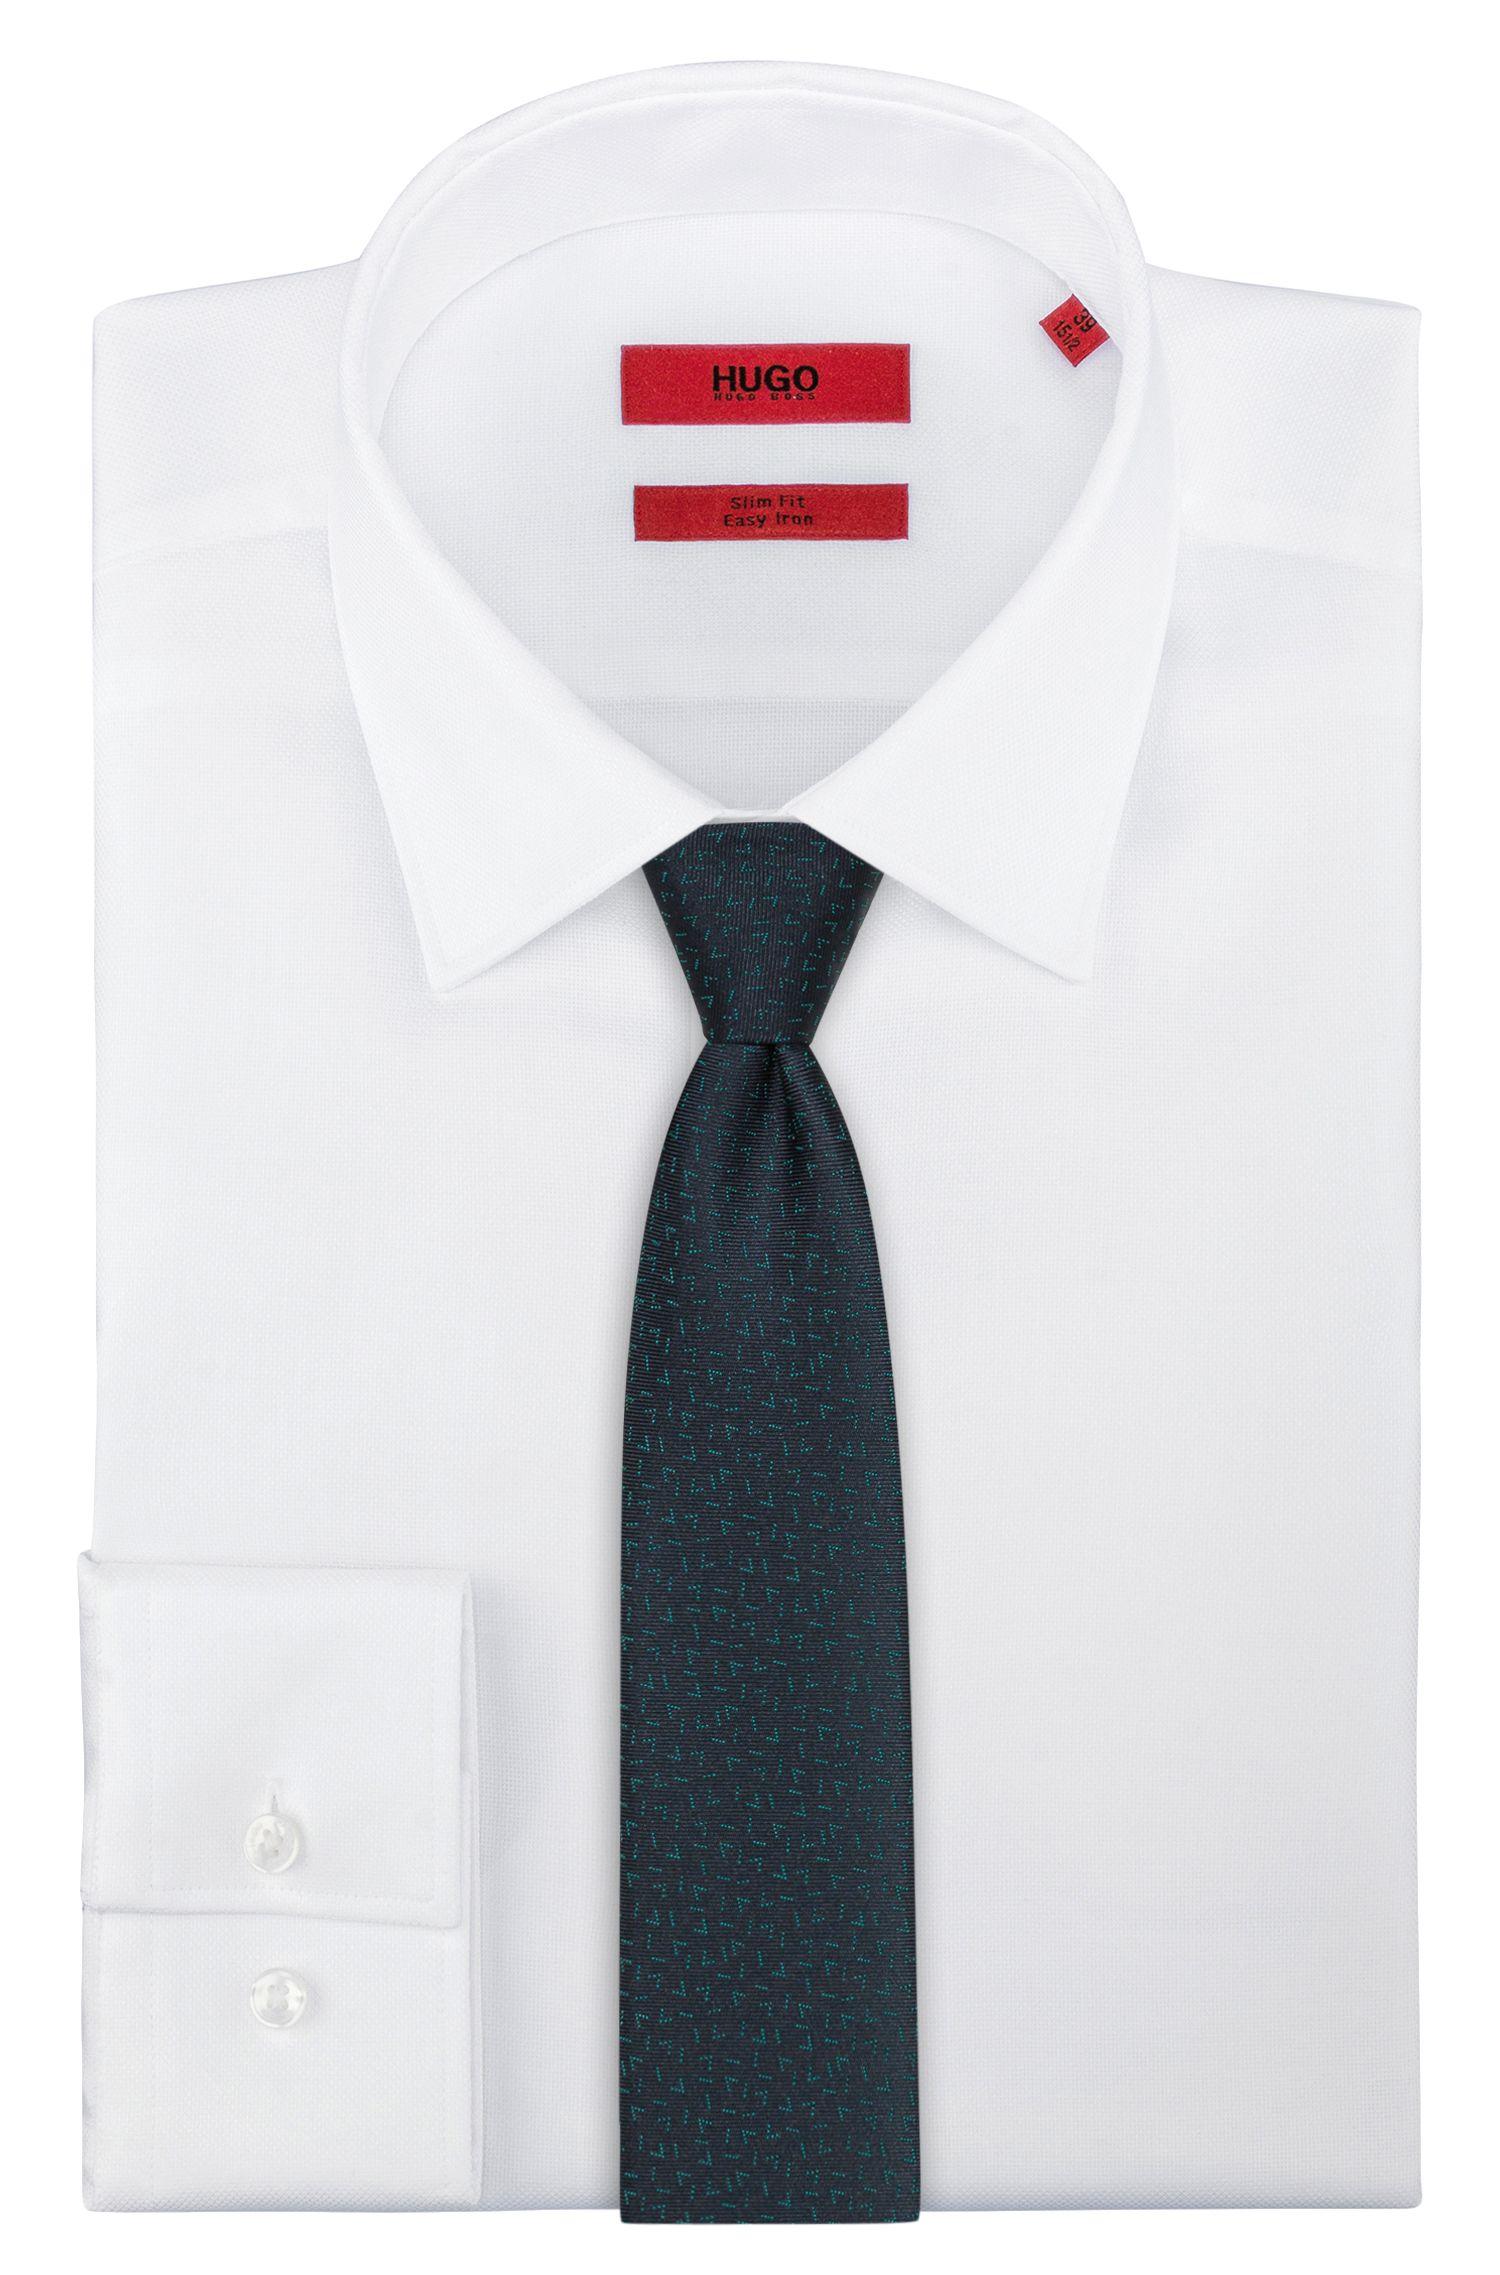 Krawatte aus reinem Seiden-Jacquard, Gemustert